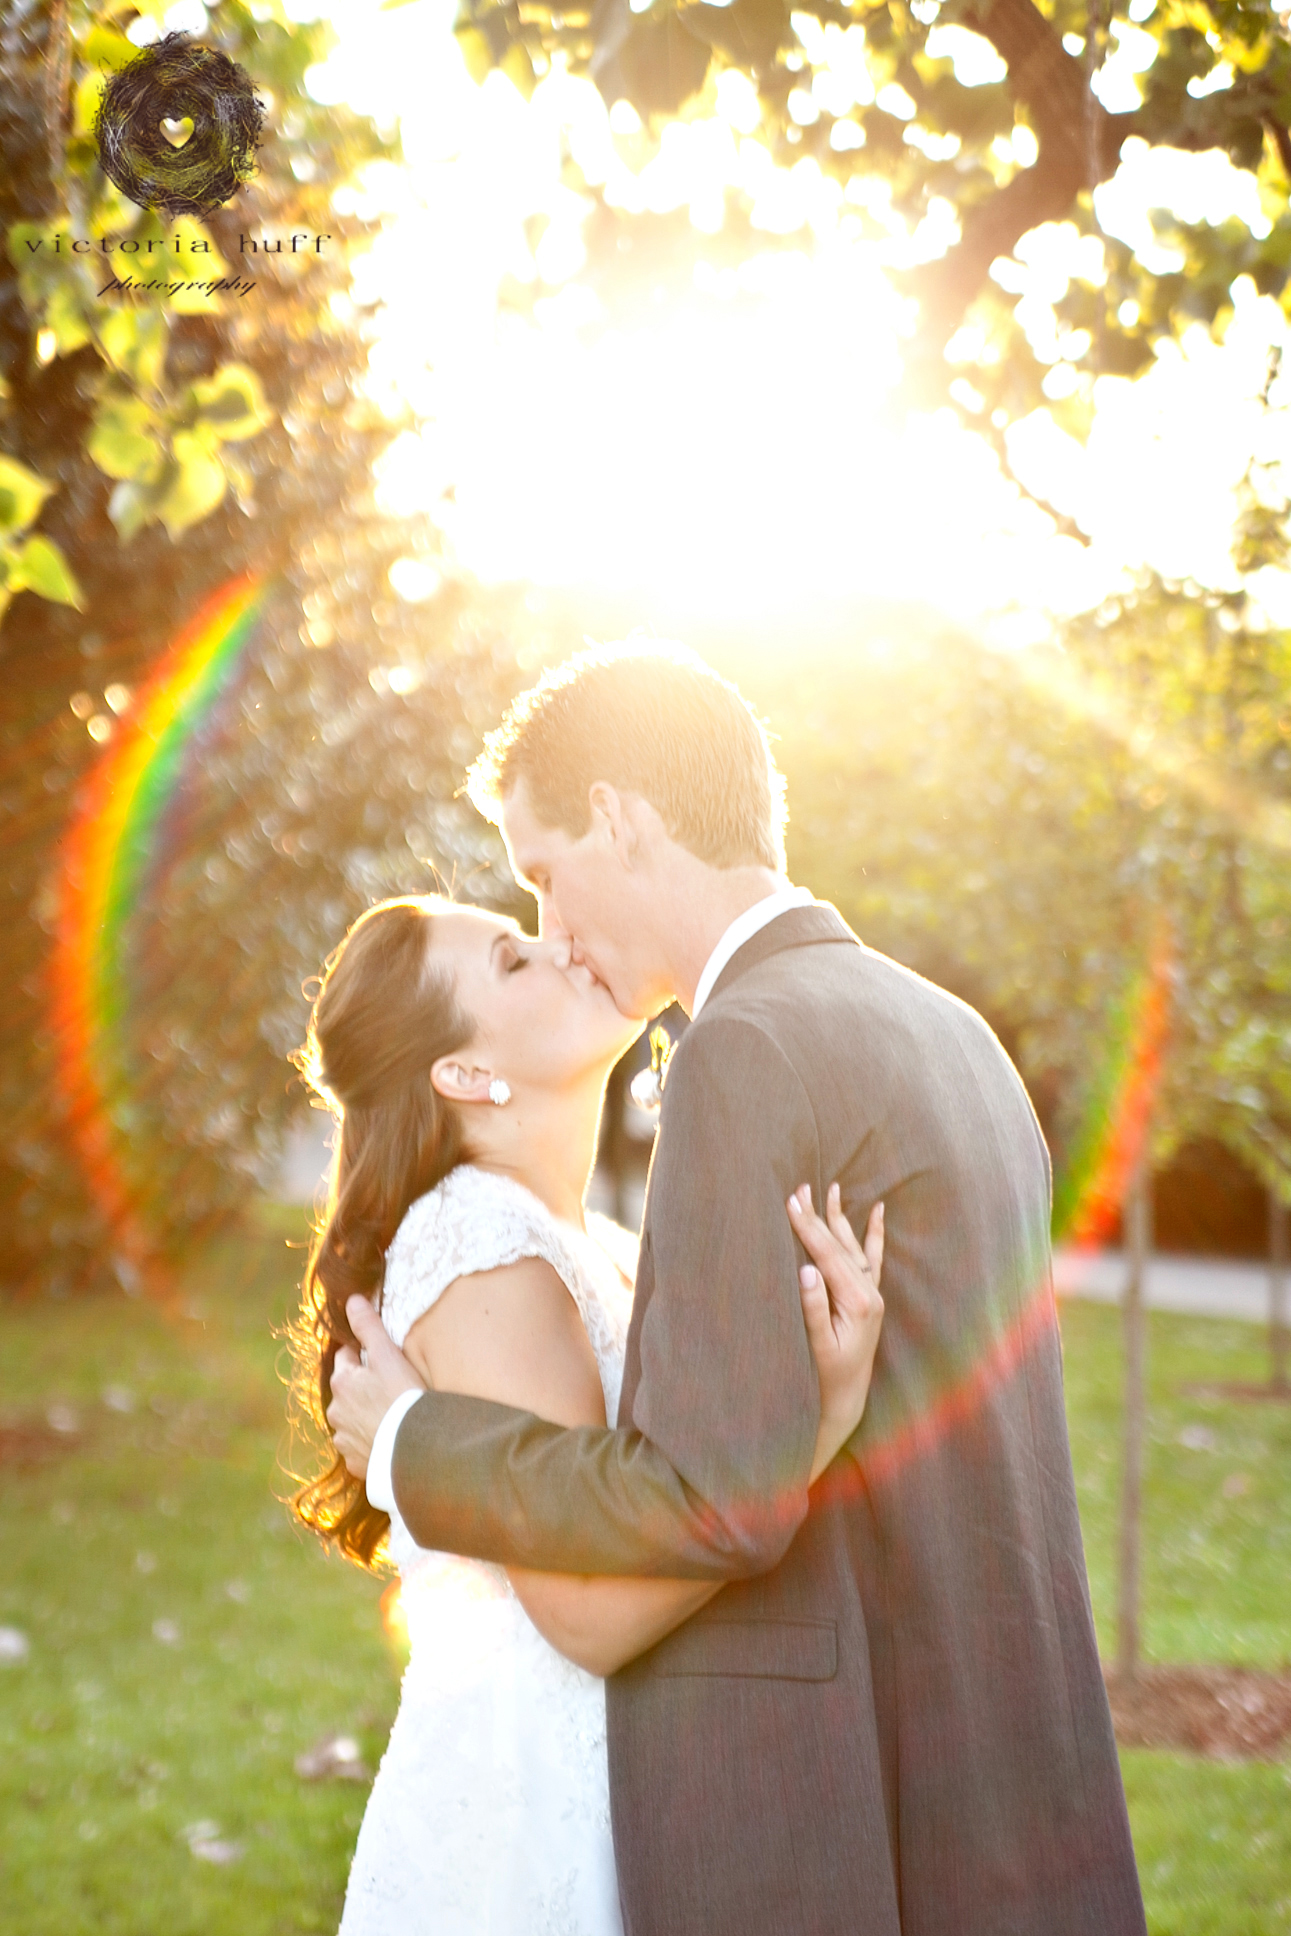 Wedding-Photography-Lindsay-Collins-Jason-Baggett-Wedding-Centennial-Park-Nashville-Tennessee-Hotel-Indigo-Vintage-714.jpg